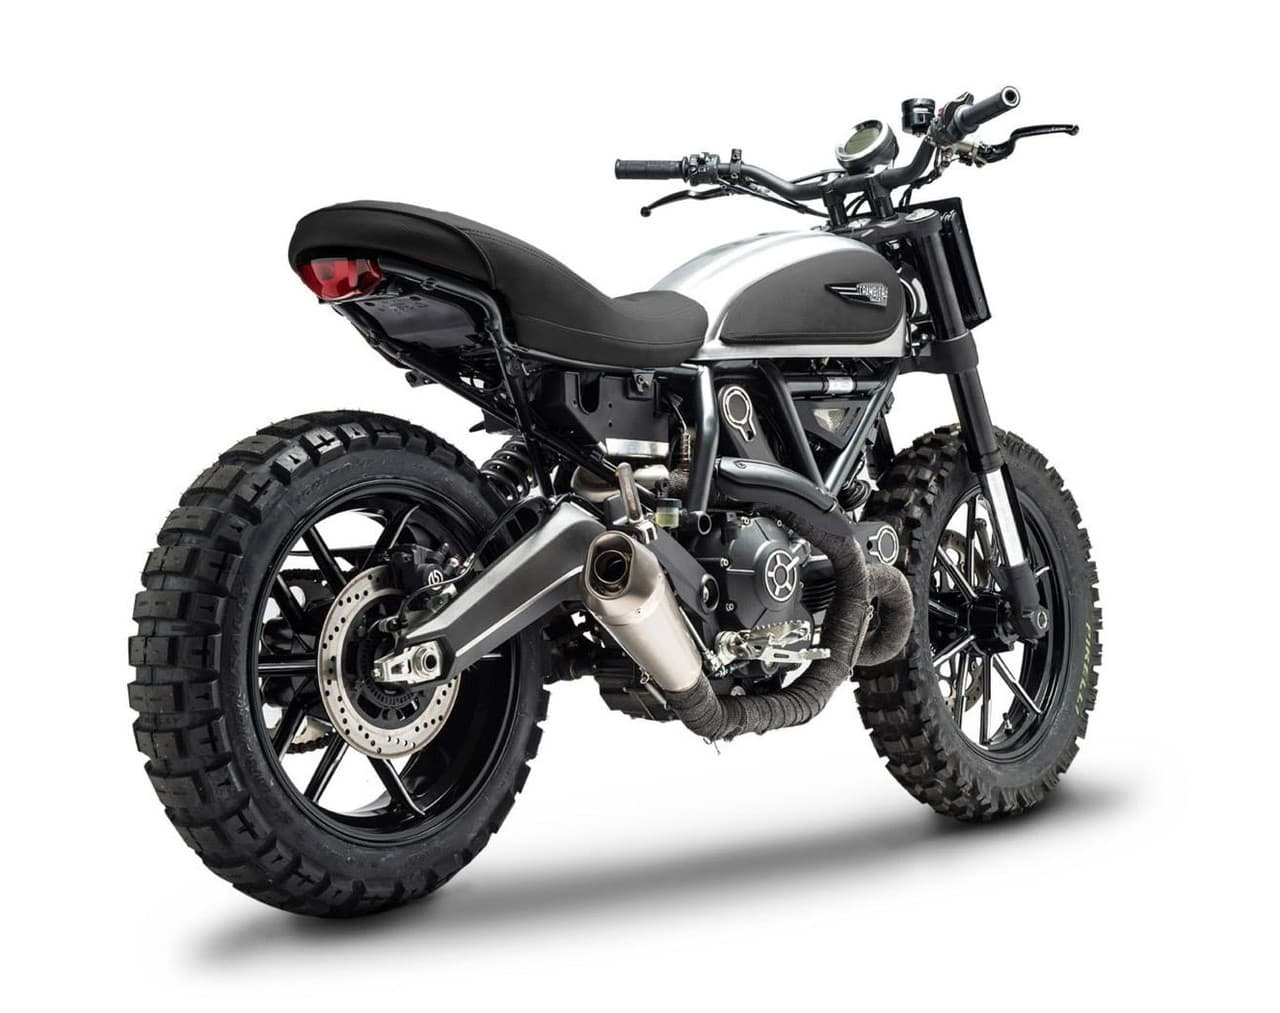 Ducati Scrambler Dirt Tracker Back View